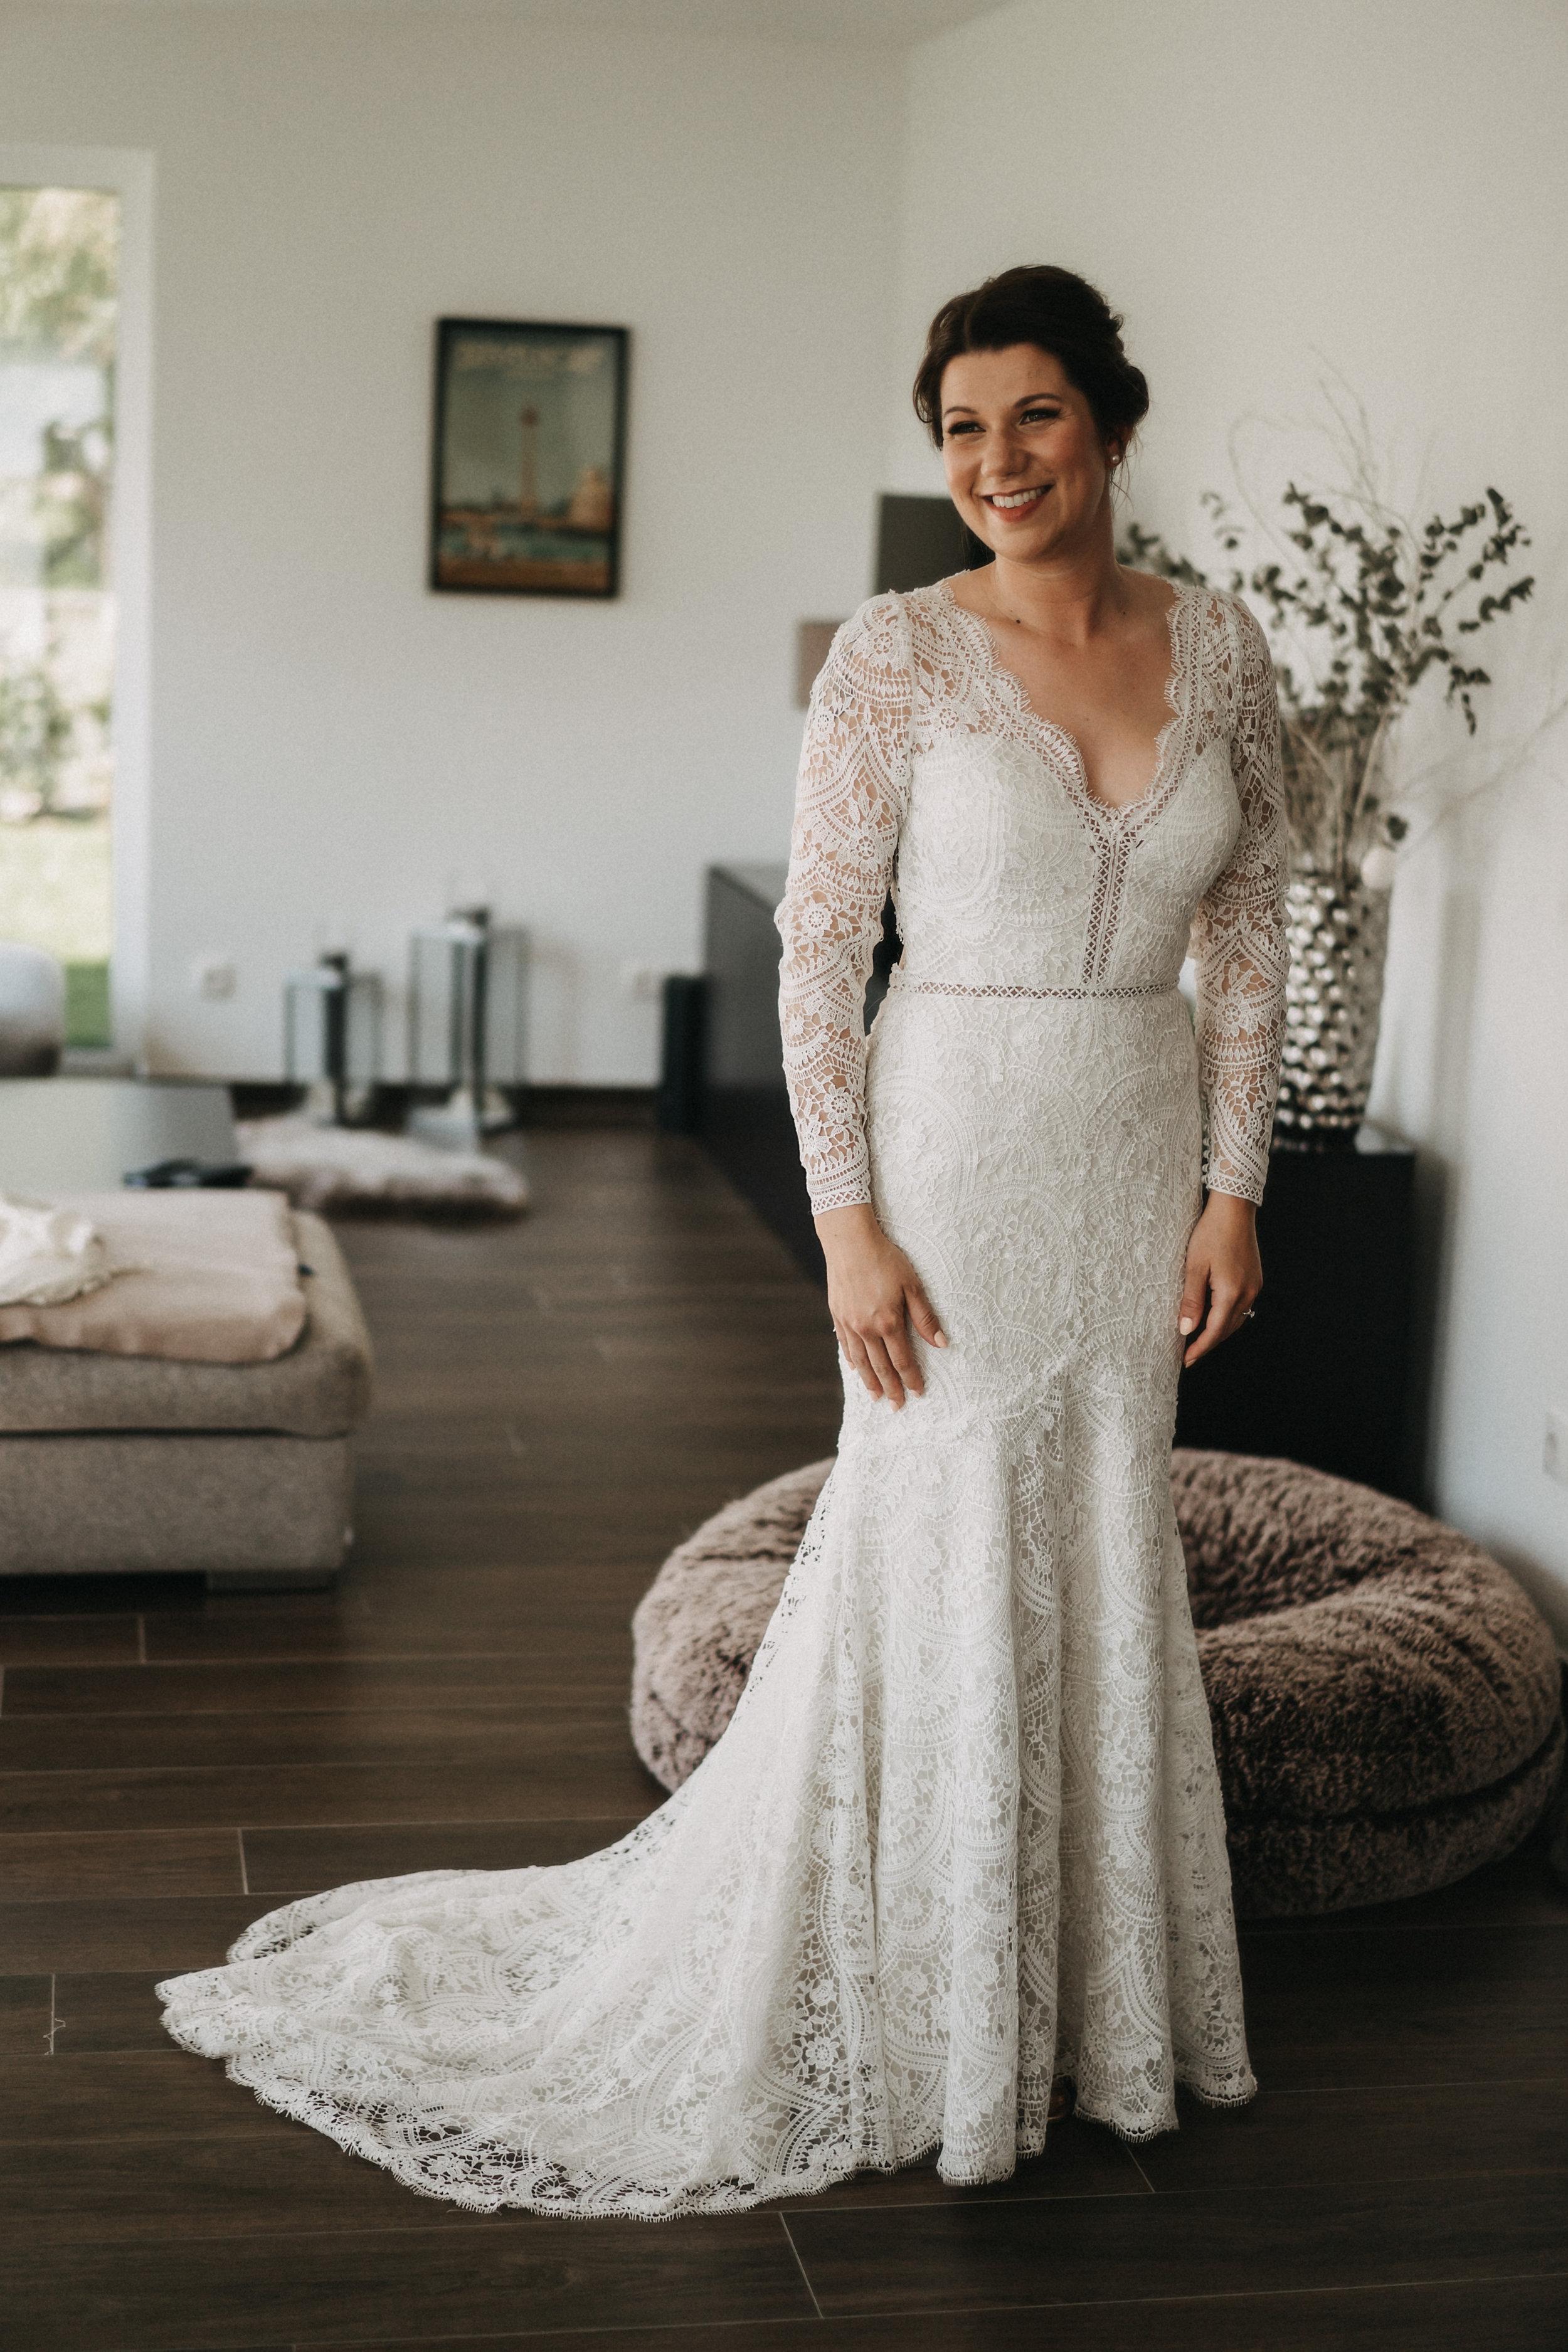 Liza - photographer kreativwedding